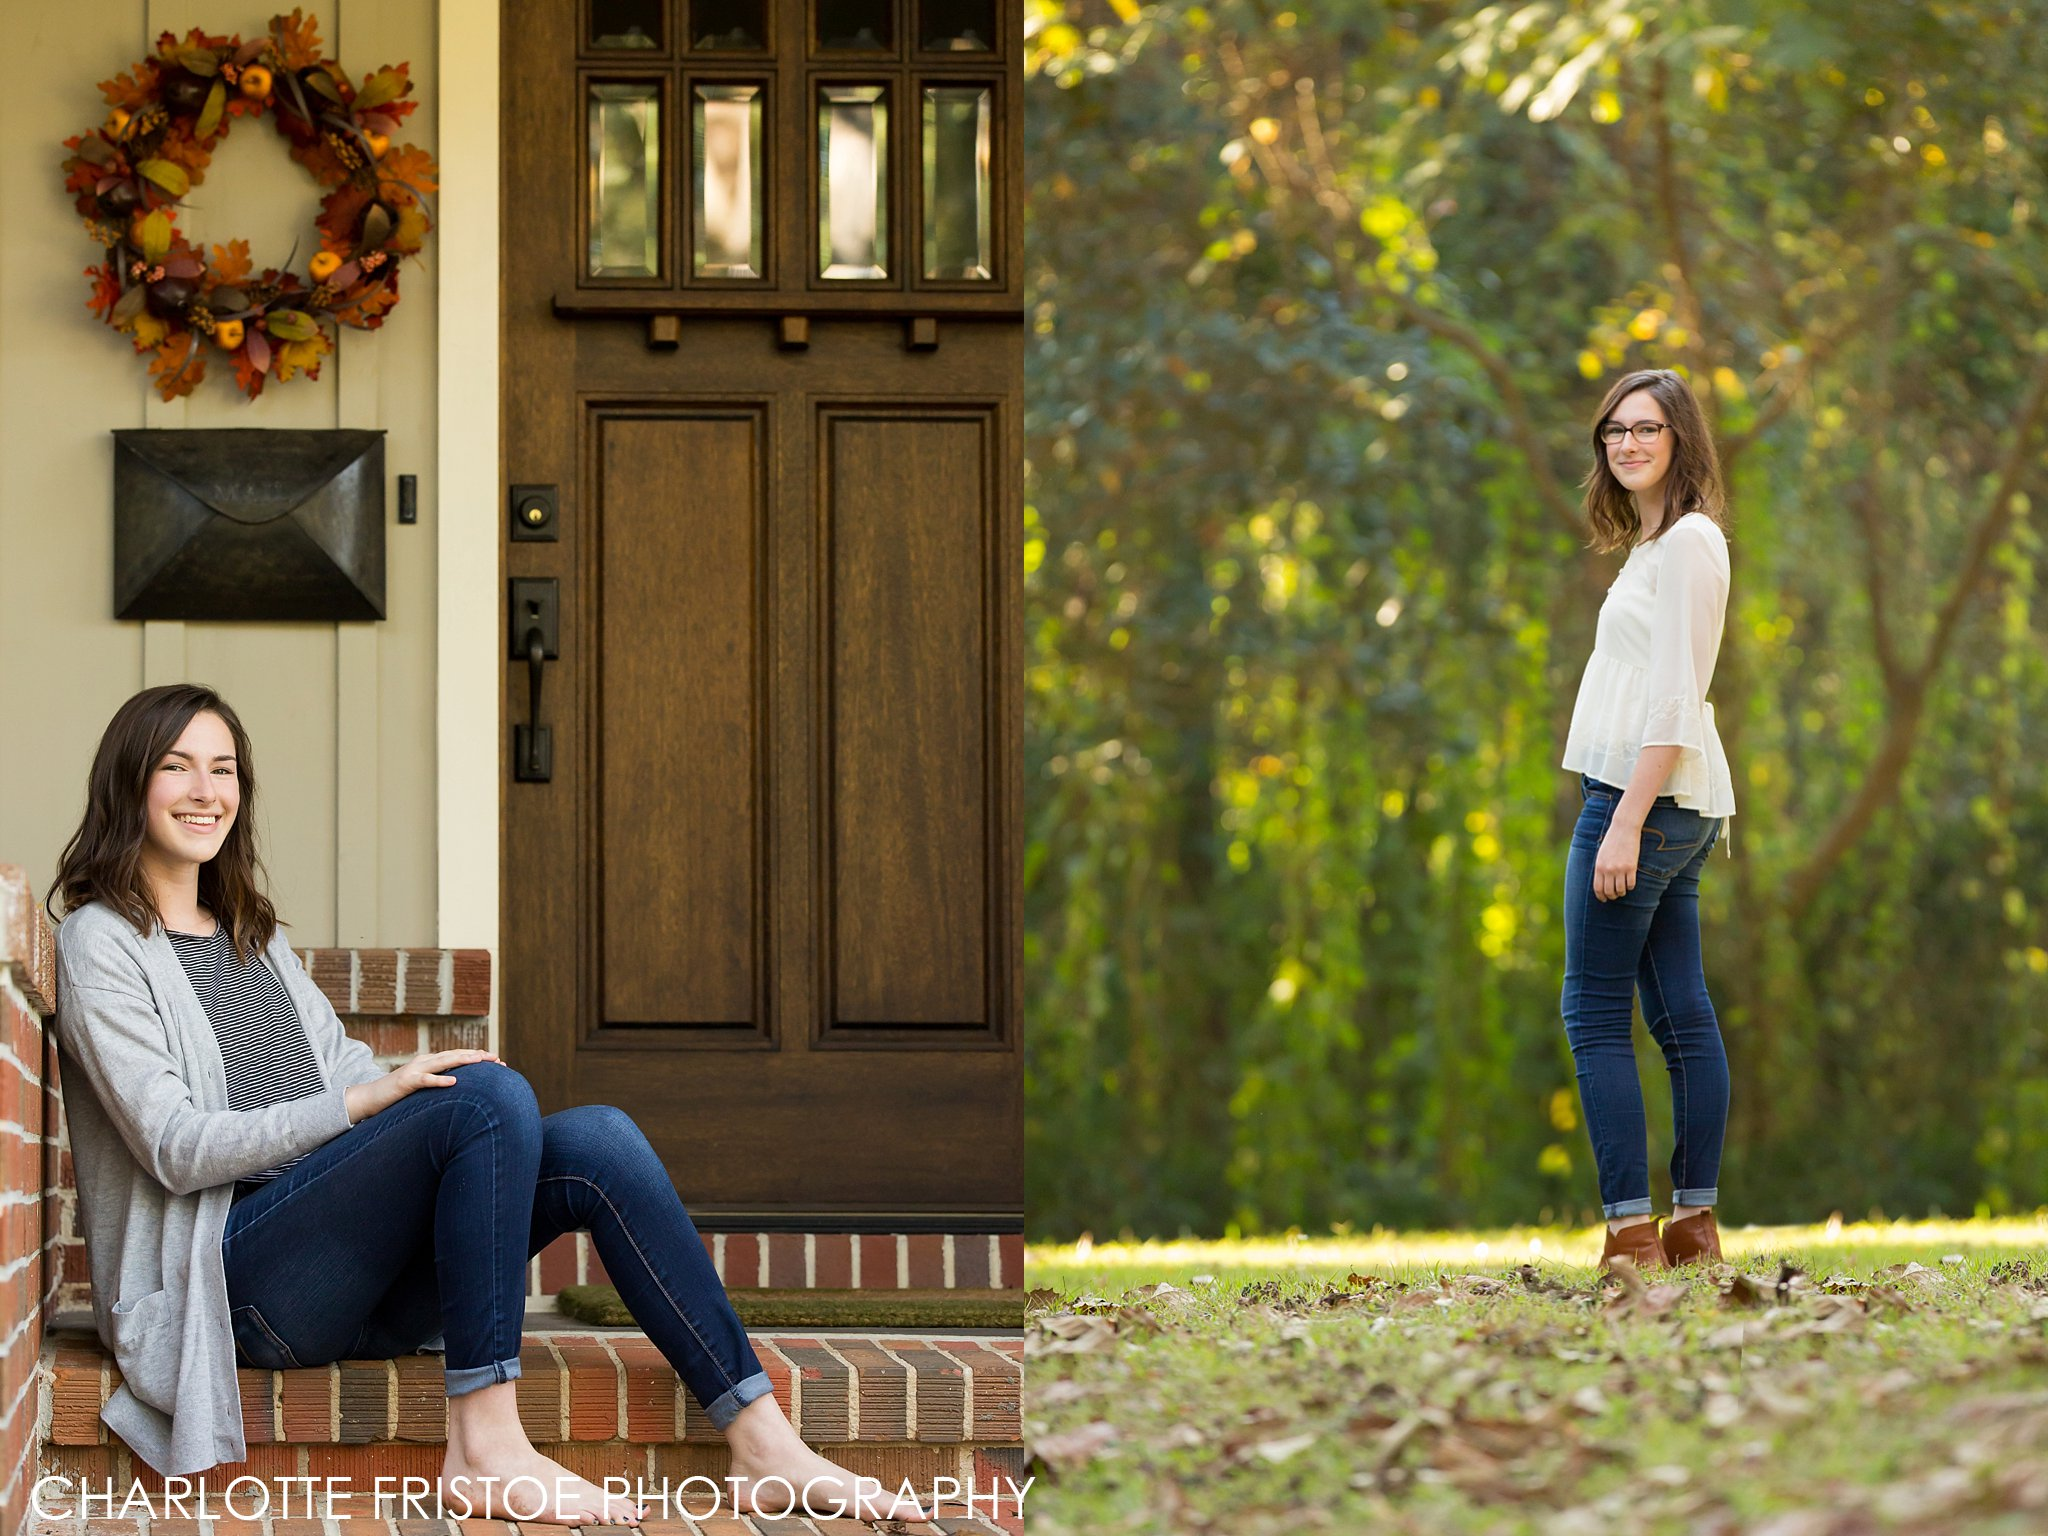 Charlotte Fristoe Photography Senior Pictures-3.jpg